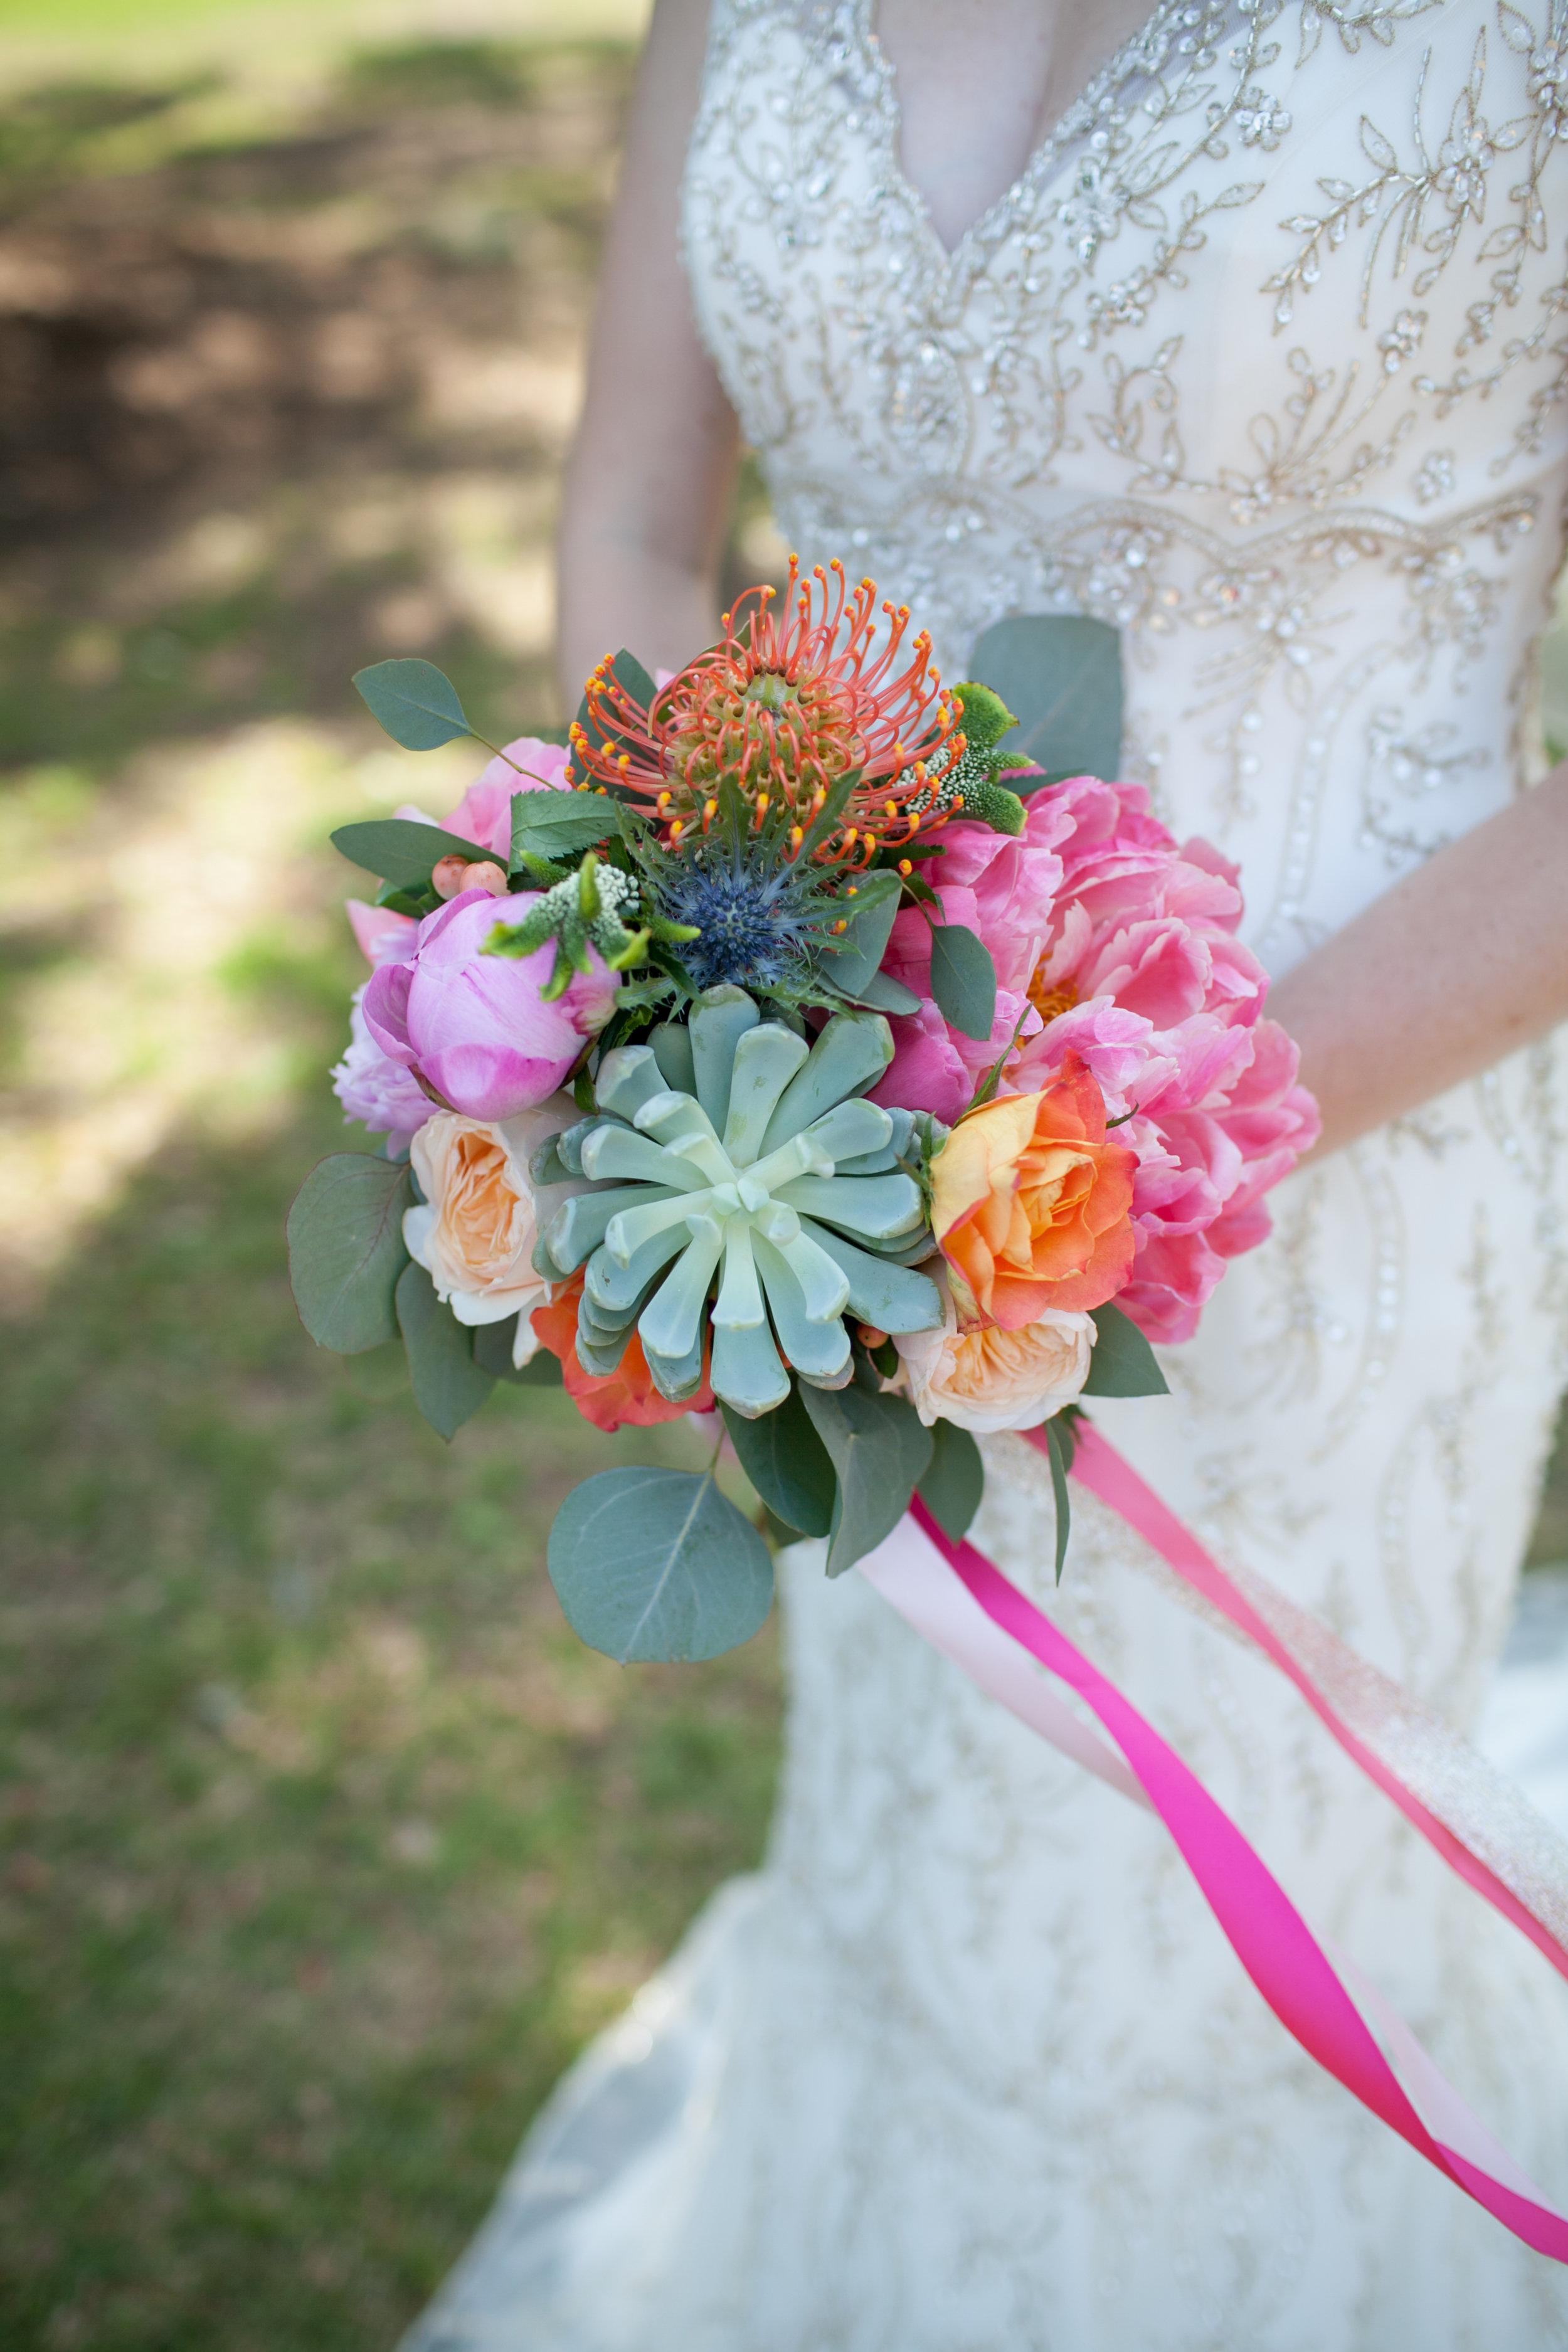 Whimsical Sunnyside Plantation wedding by Carmen Ash Photography